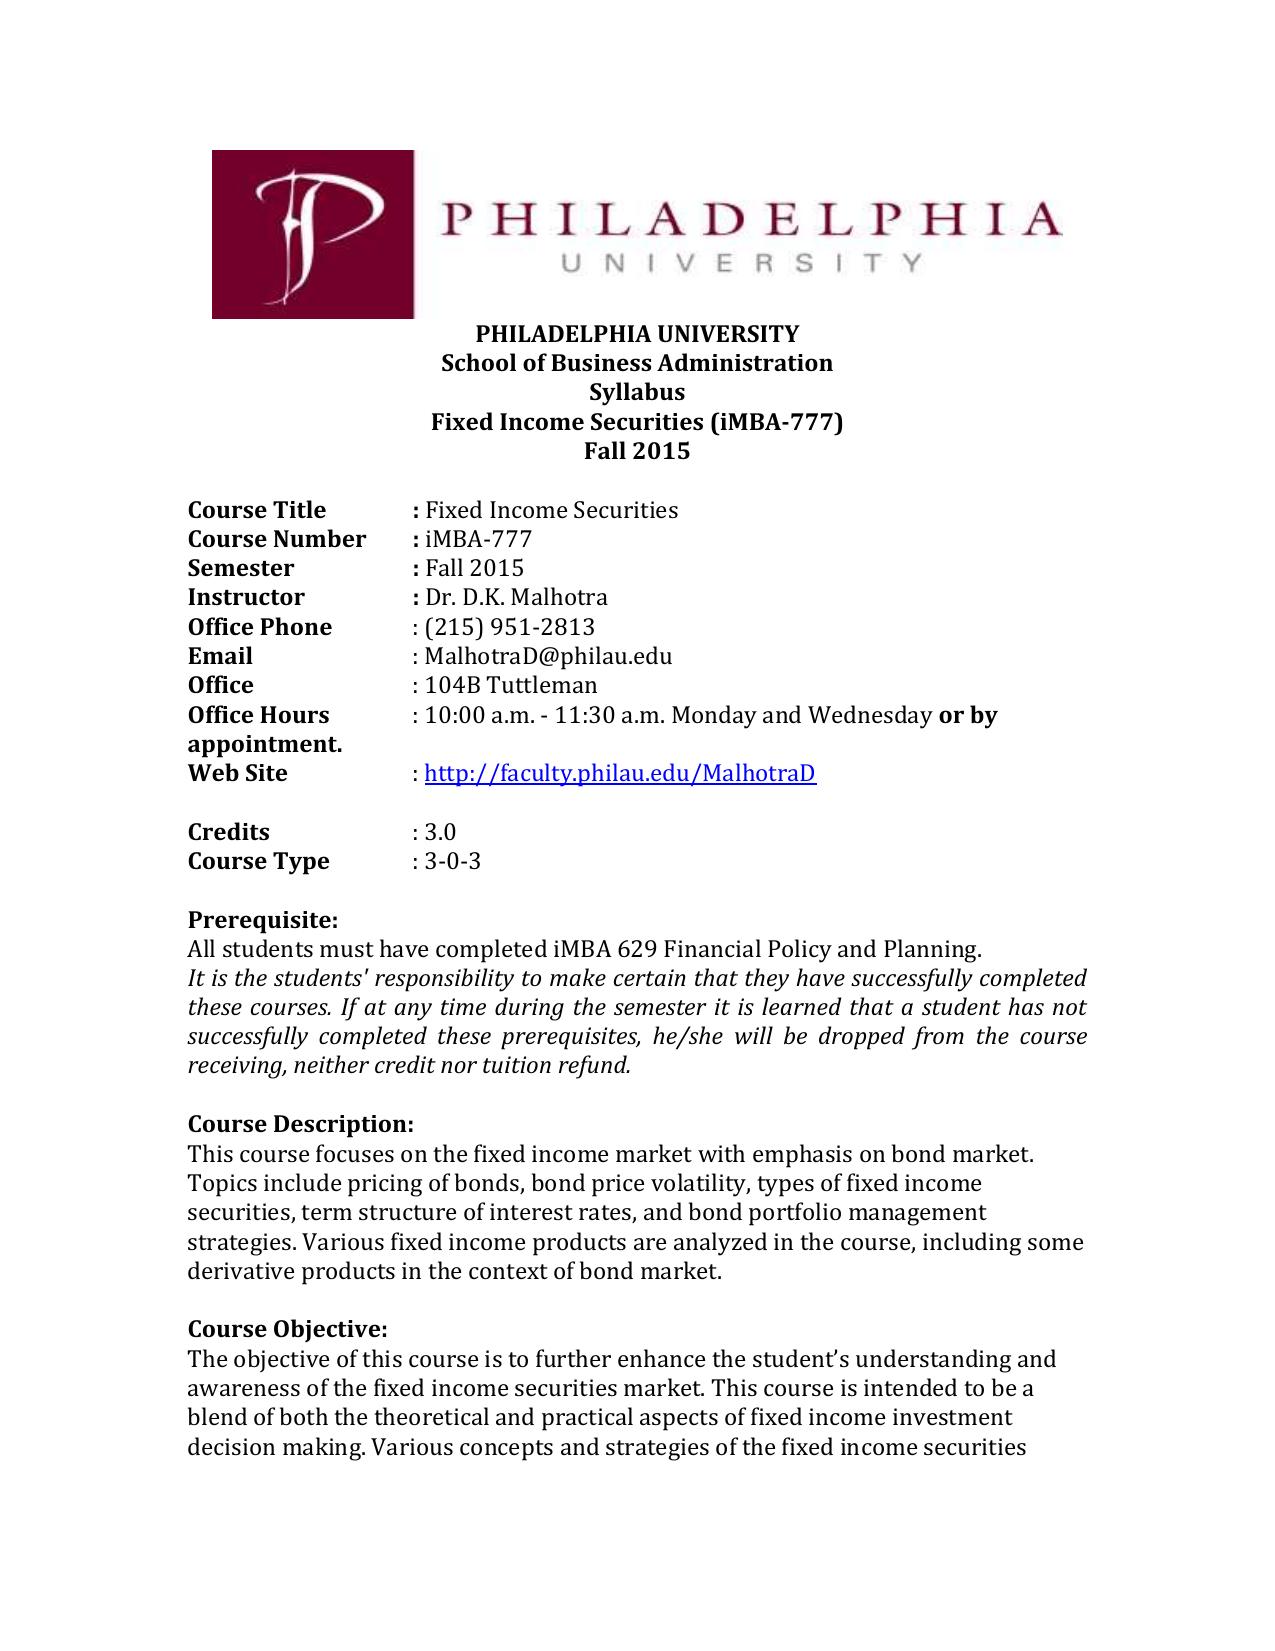 Philadelphia University Tuition >> Fixed Income Securities Philadelphia University Faculty Websites